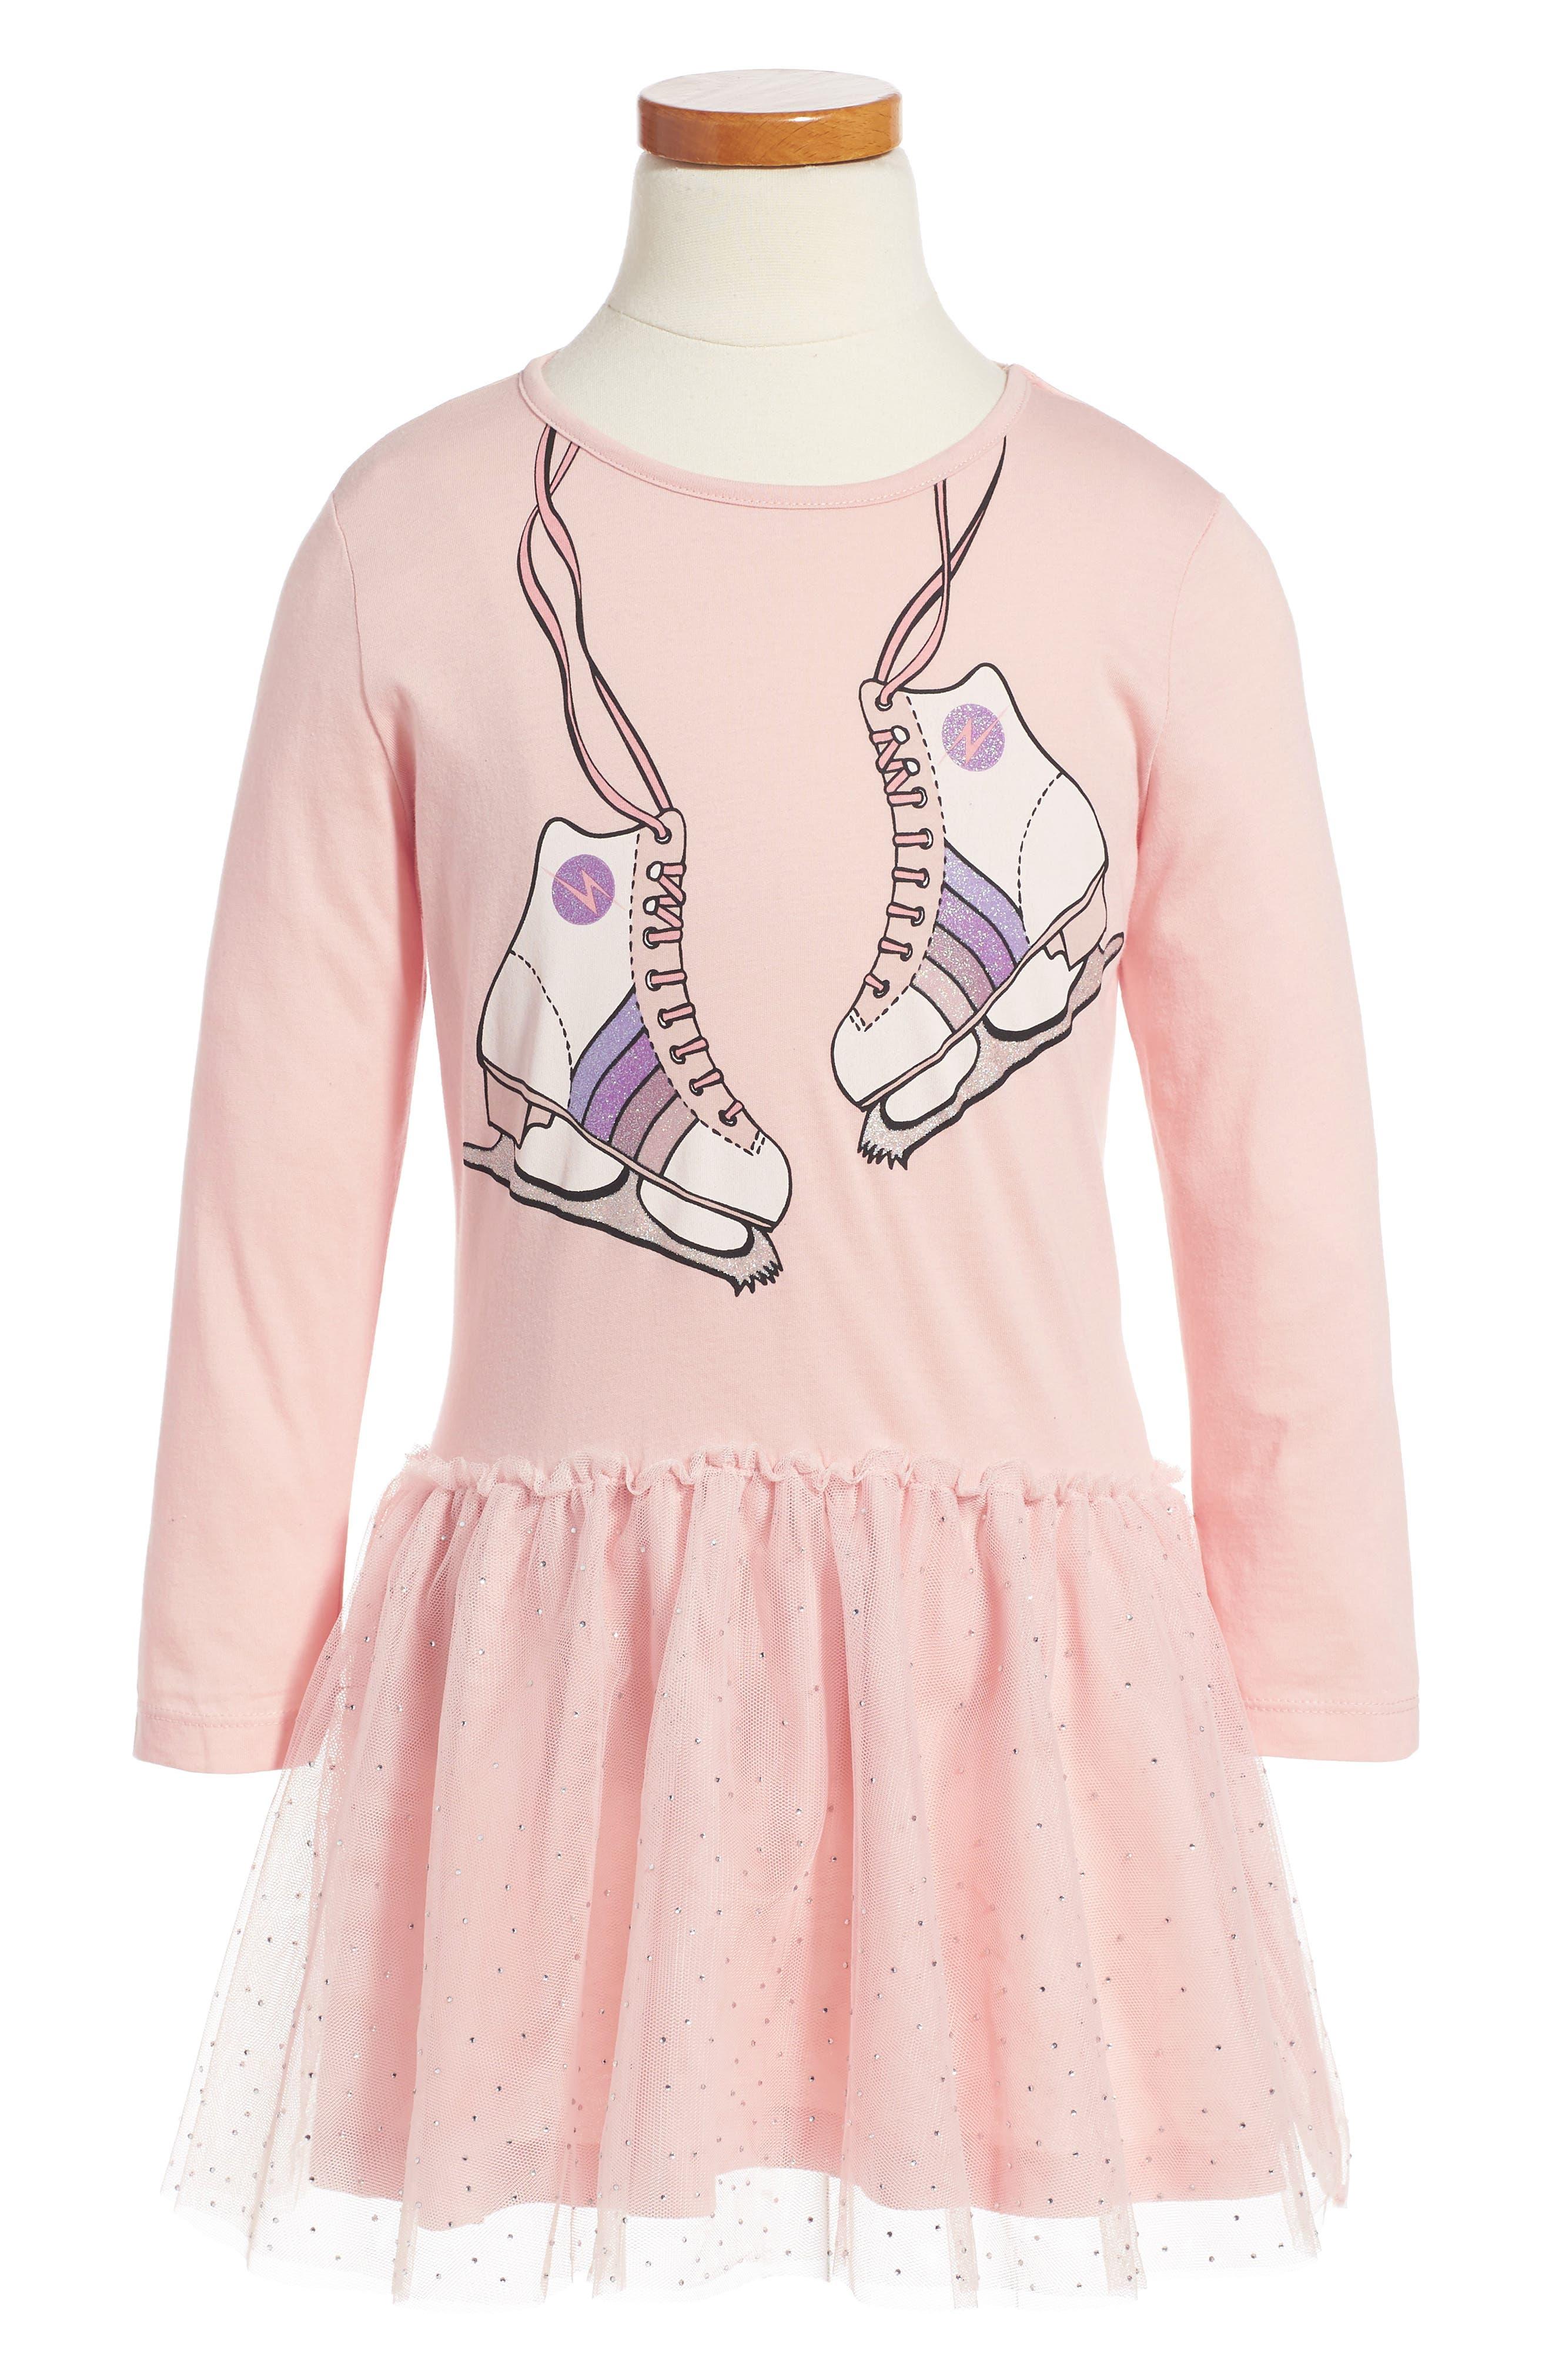 Kids Primrose Skates Dress,                             Main thumbnail 1, color,                             Pink